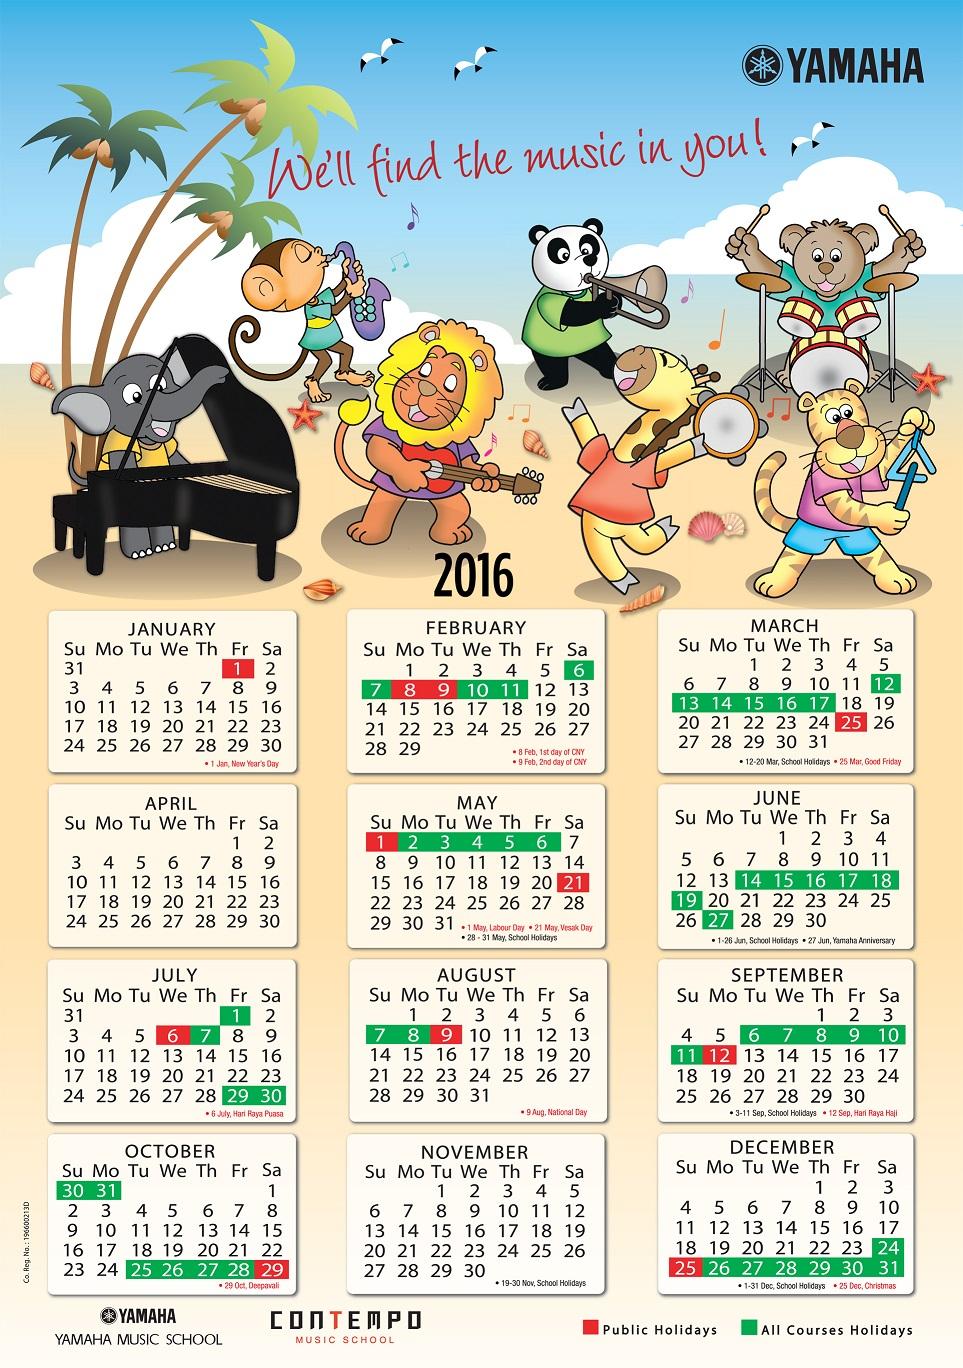 Electone Corner: 2015 with Yamaha Calendar 2020 Singapore